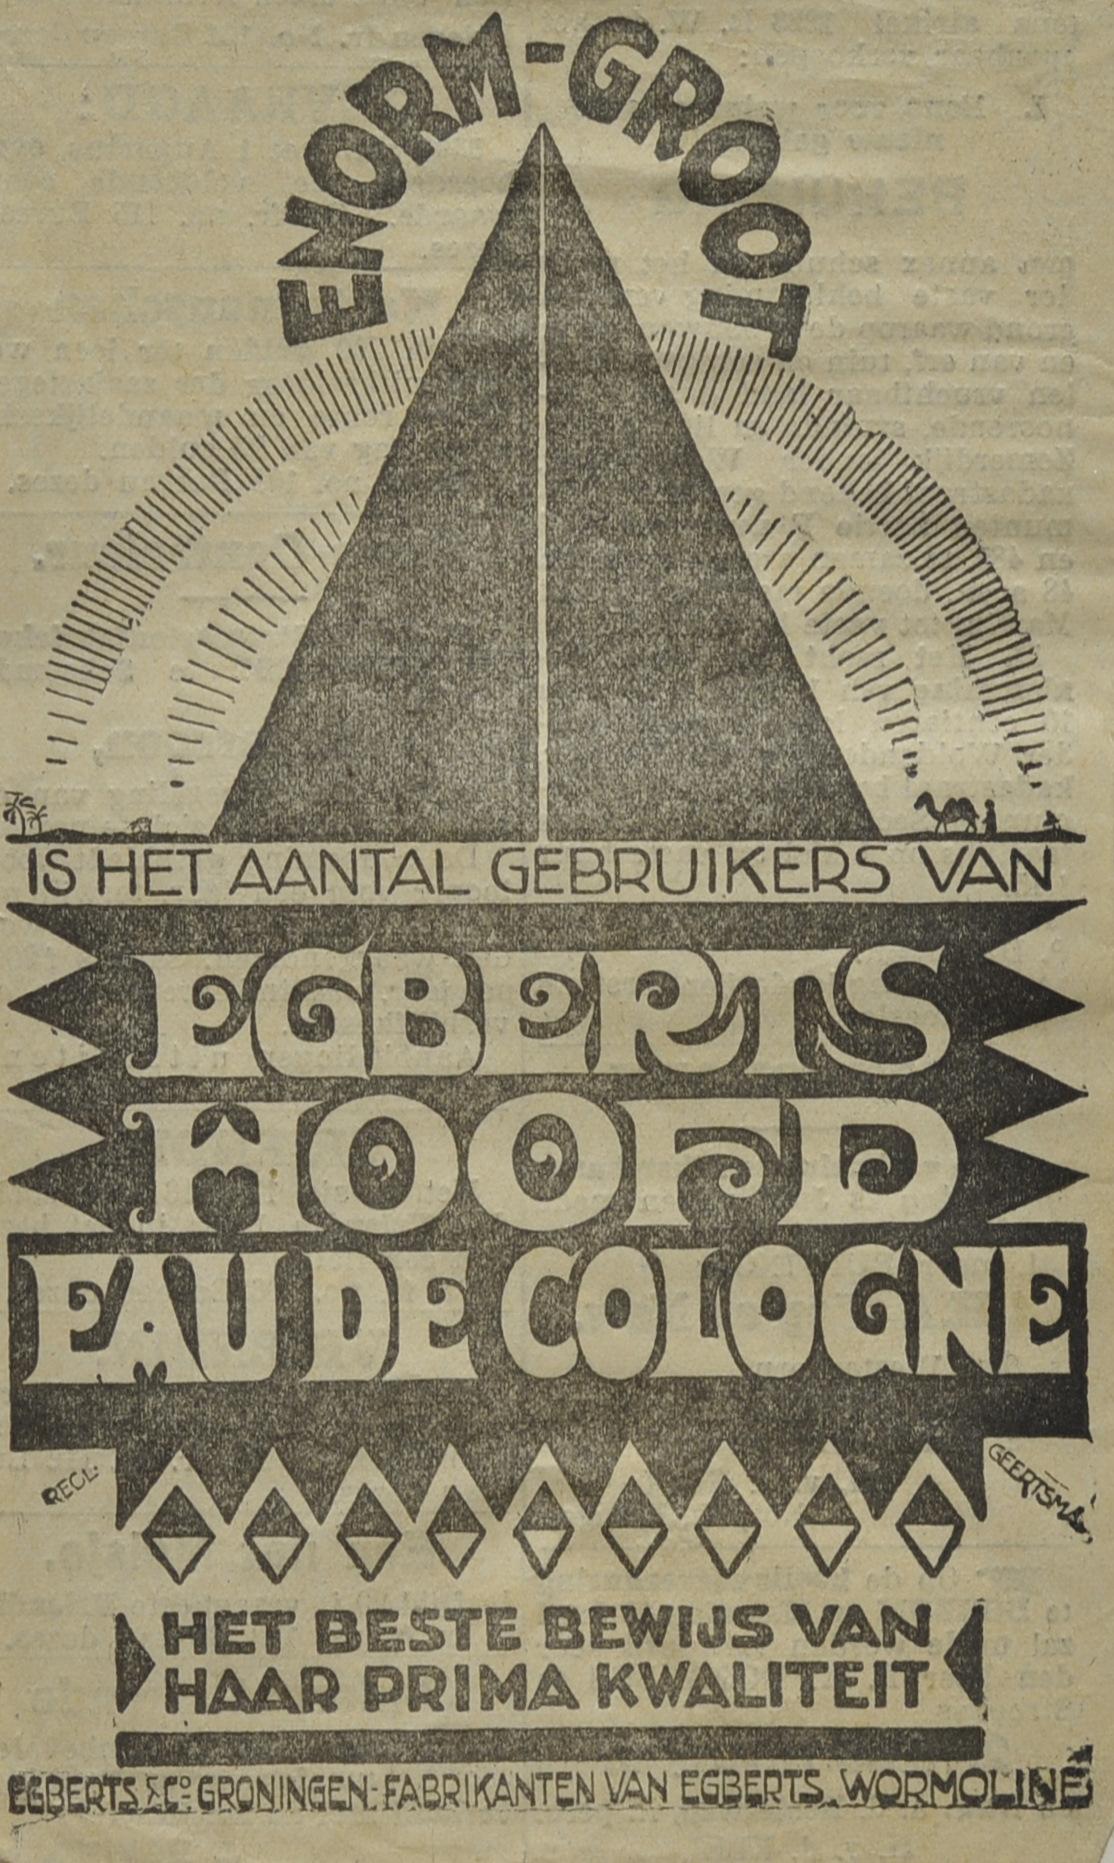 Egberts Hoofd Eau de Cologne, 1918-1940